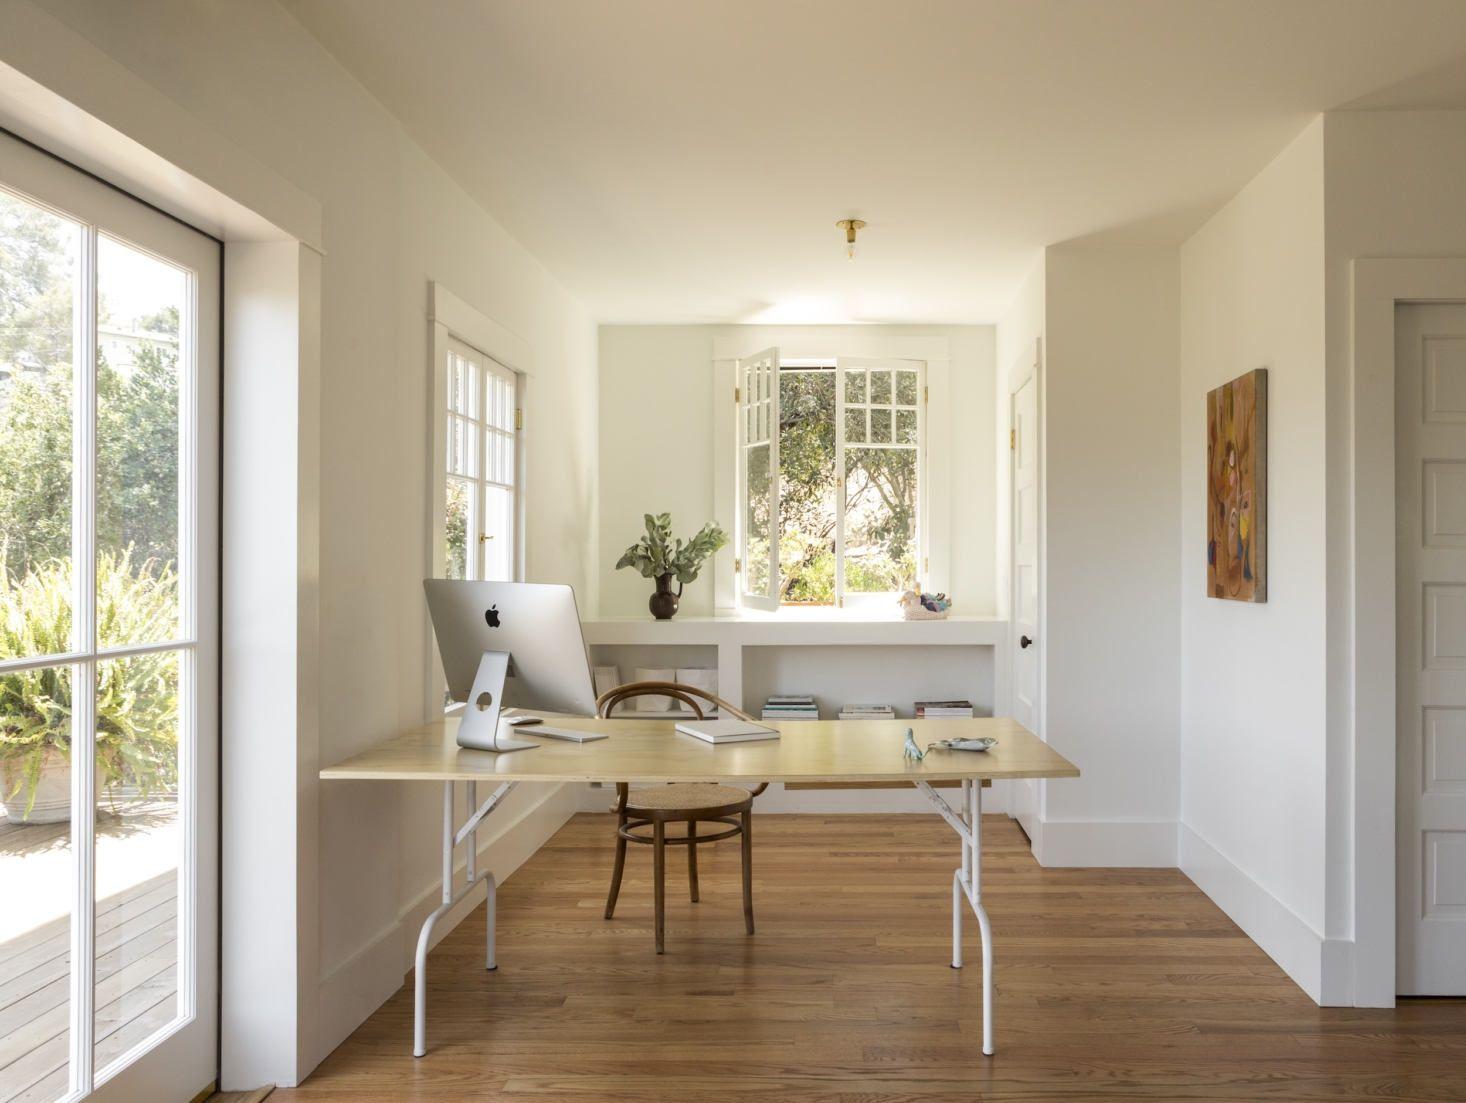 Shift To Neutral Jewelry Designer Kathleen Whitaker S La Home 2 0 Home Decor Home